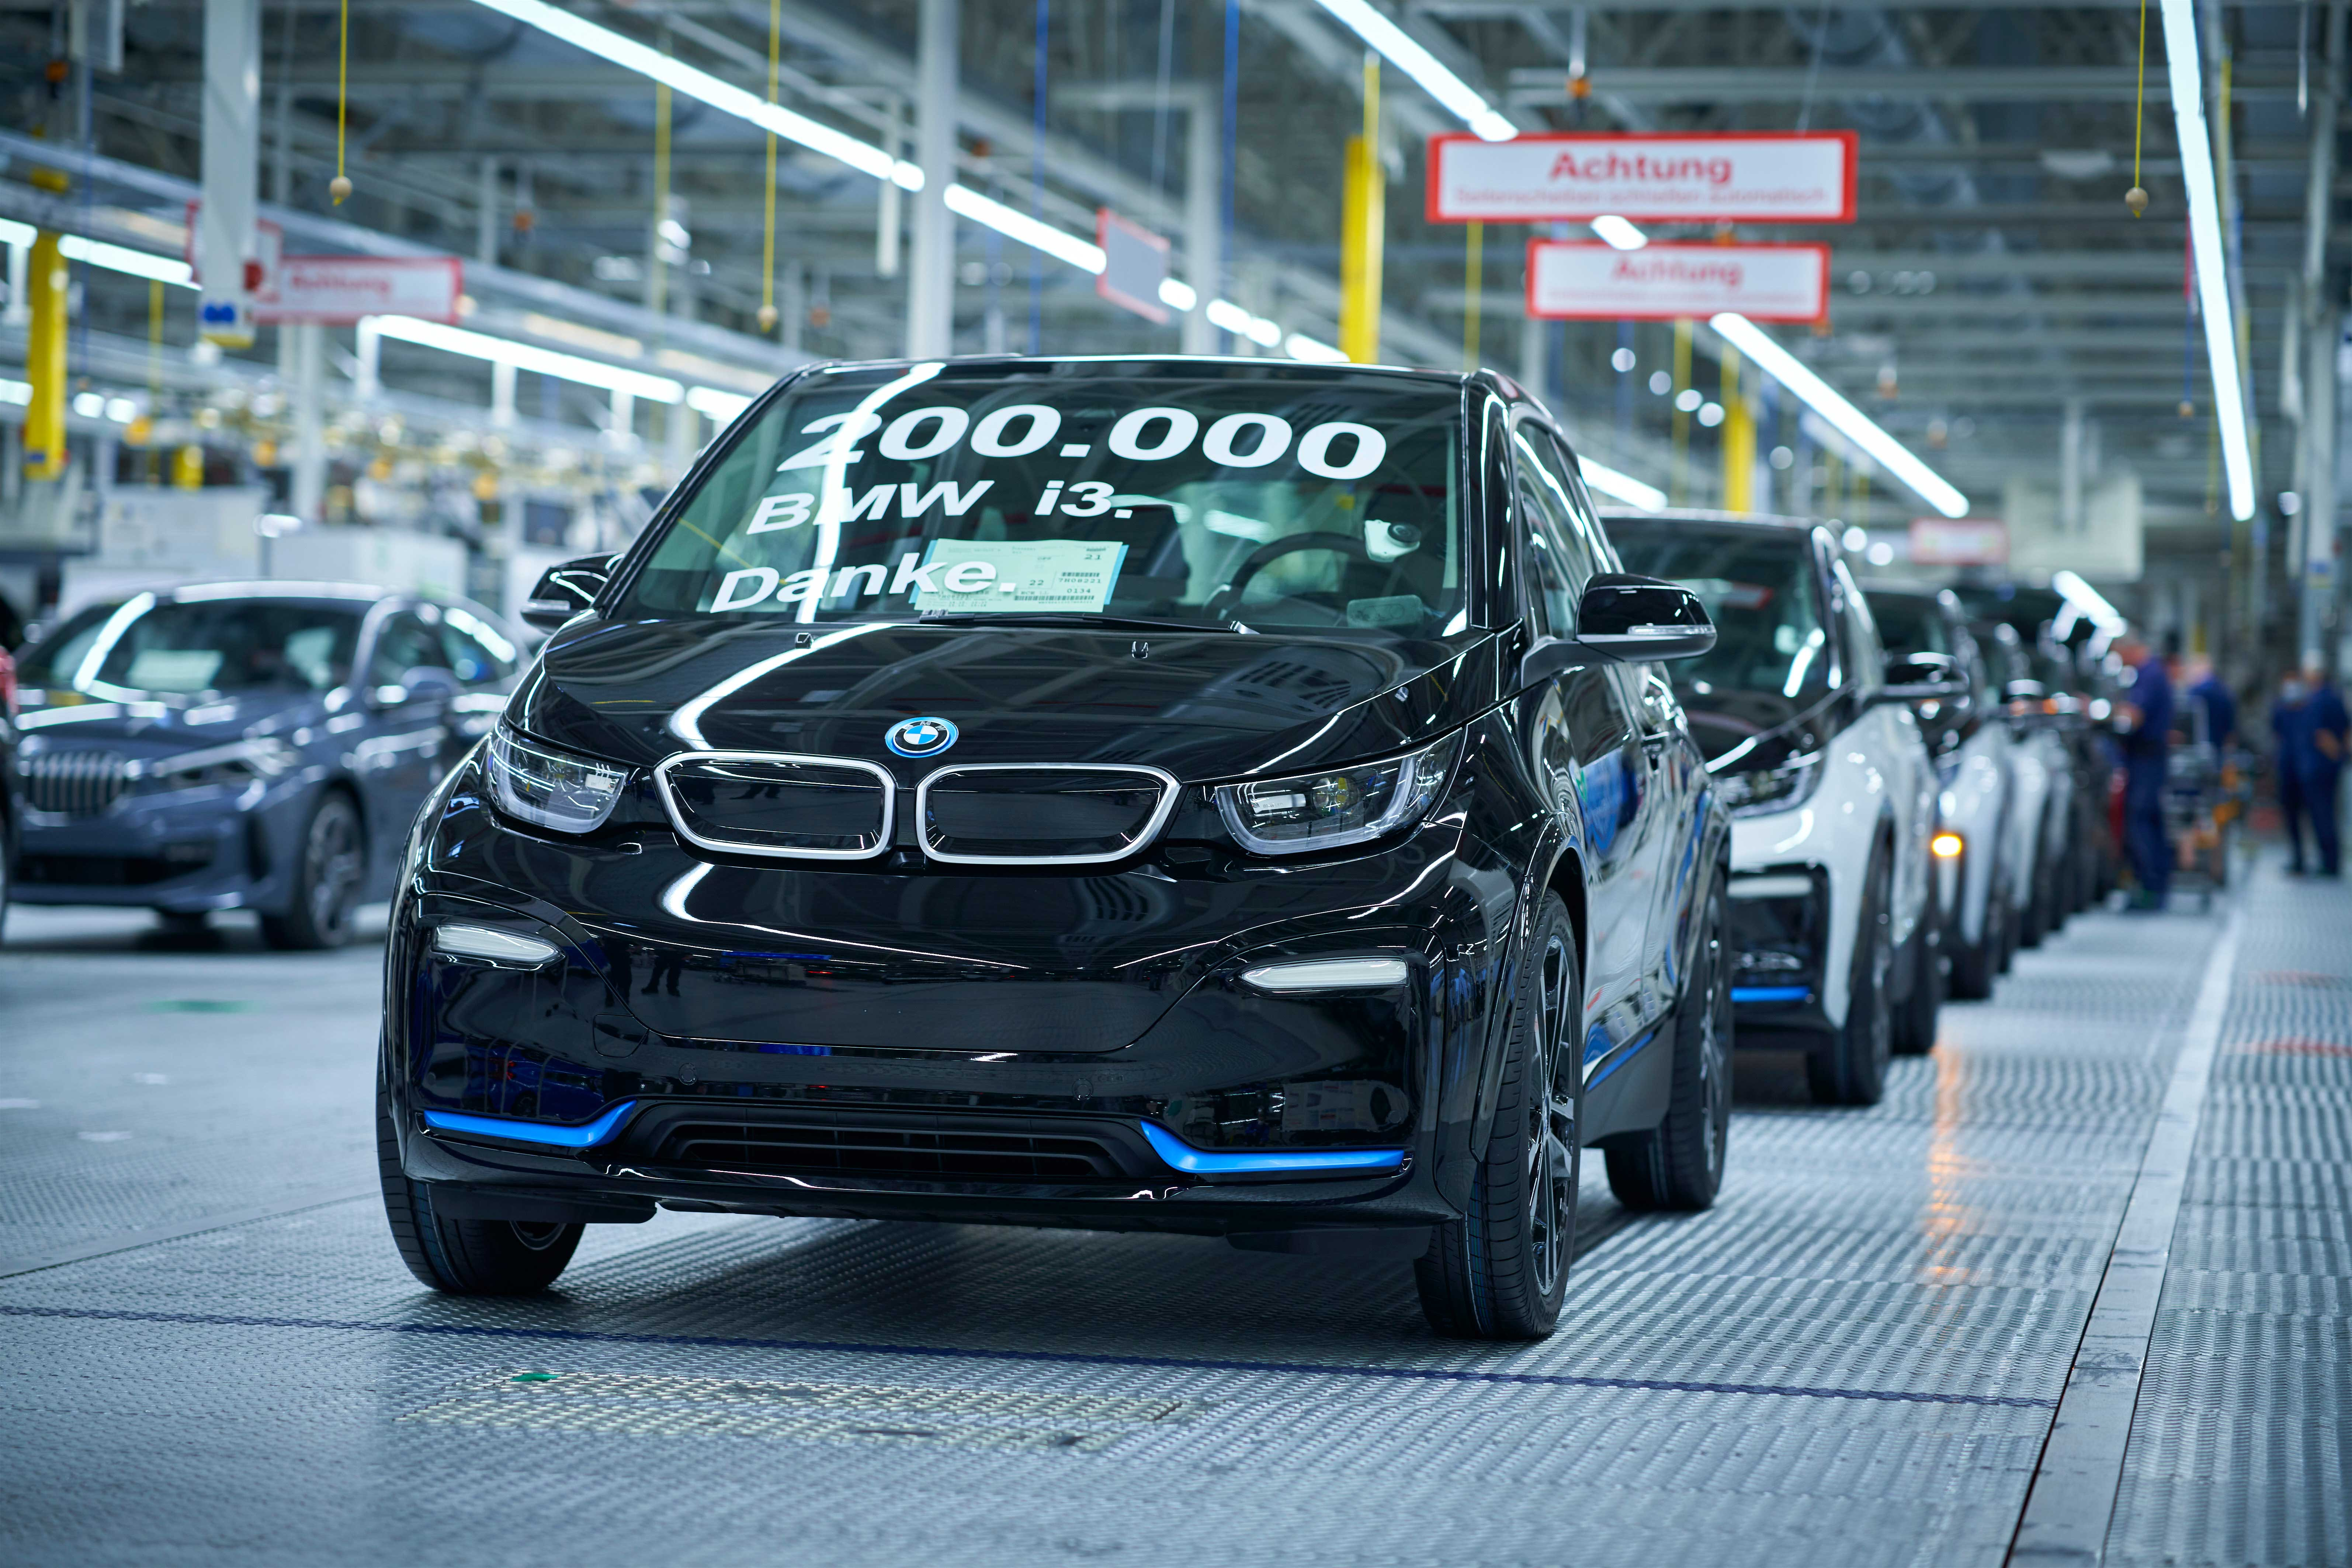 200.000'inci BMW i3 banttan indi